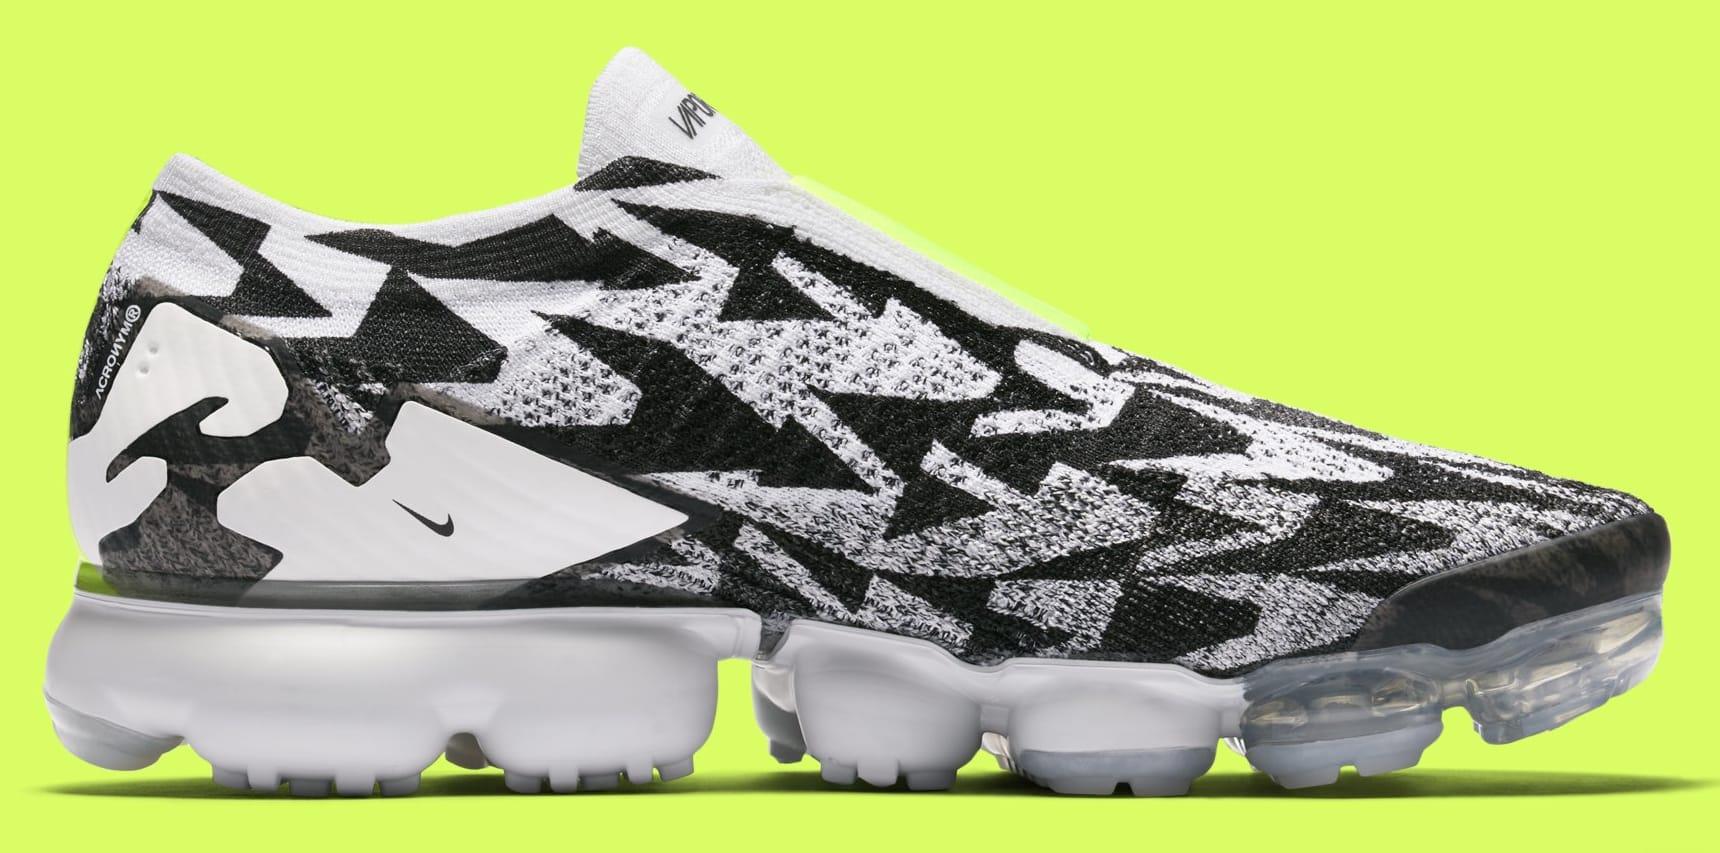 ... run shoes Image via Nike Acronym x Nike Air VaporMax Moc 2 AQ0996-001  ... 3f613517e